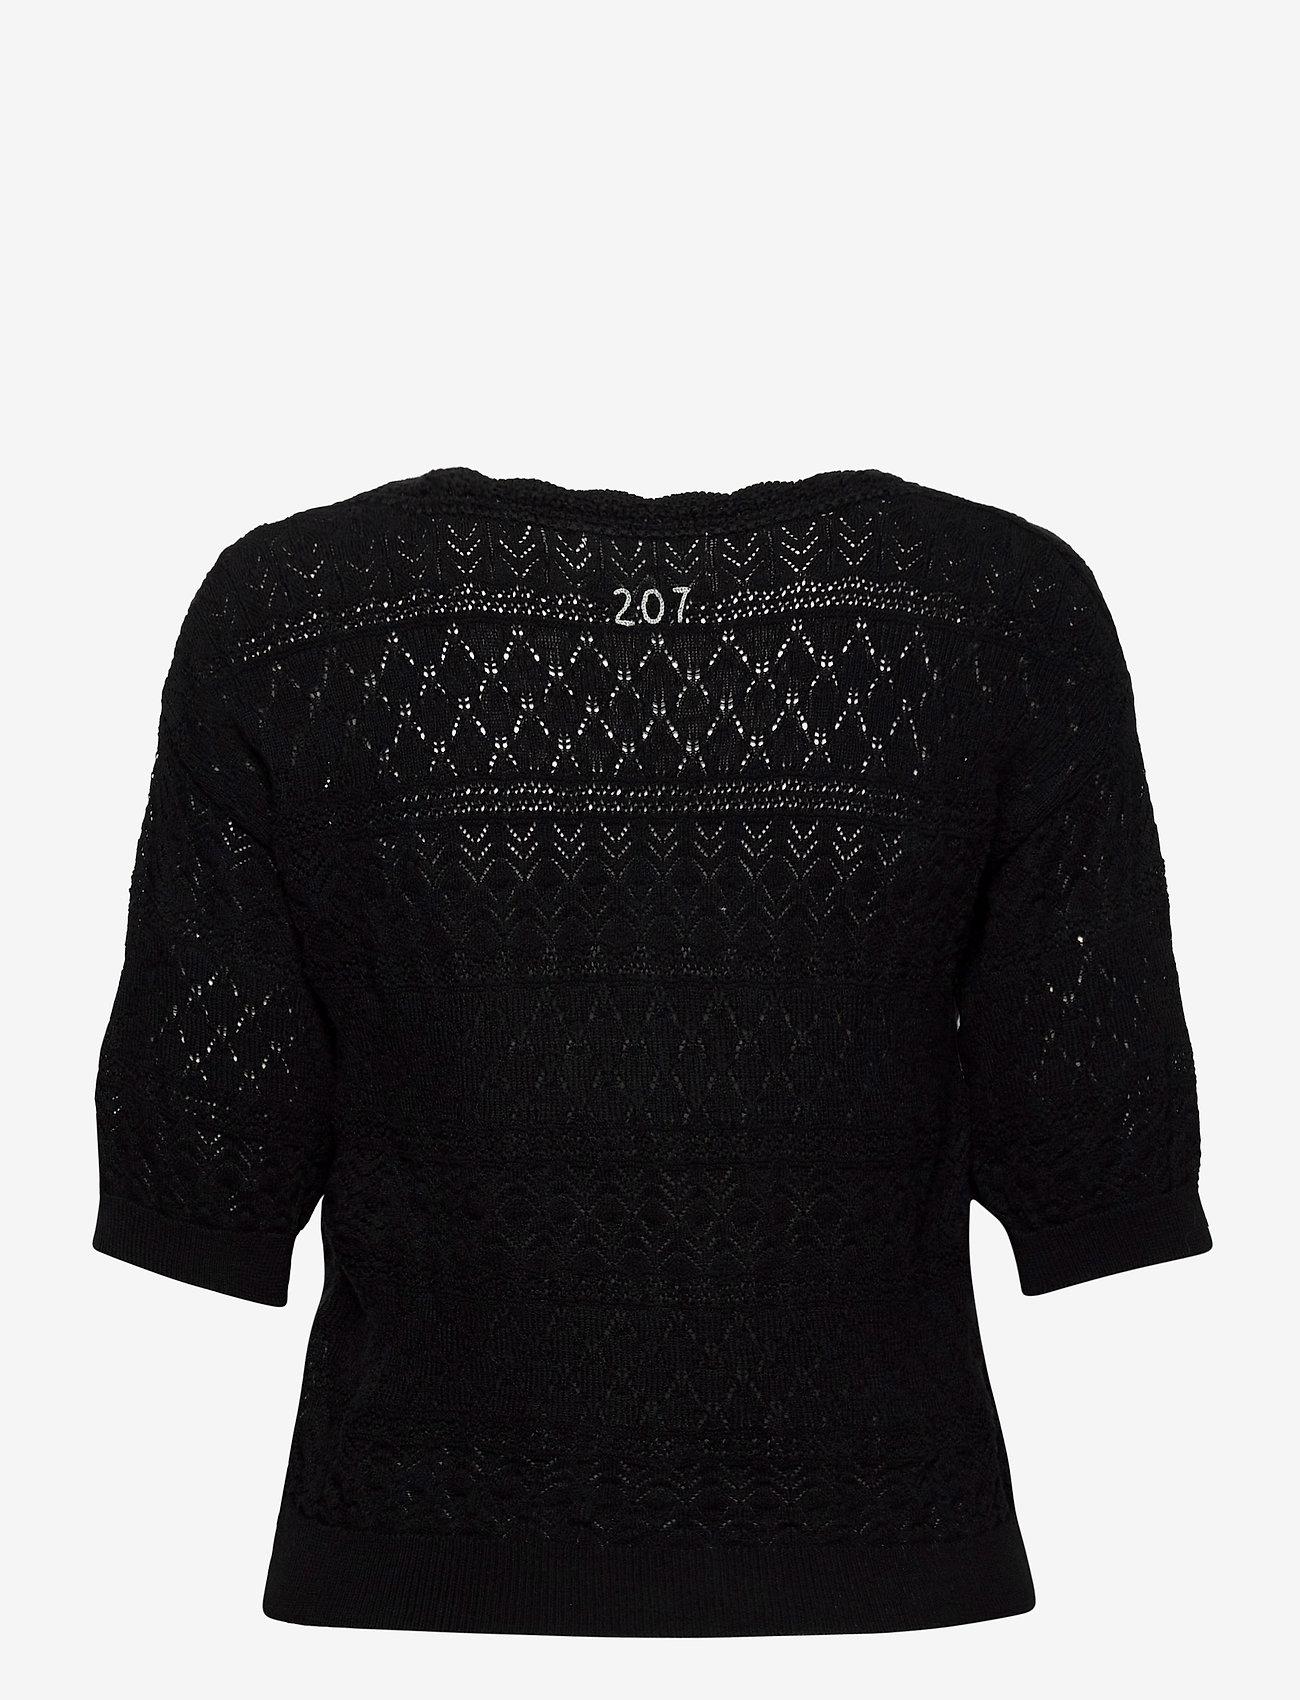 ODD MOLLY - Lucky Charm Sweater - hauts tricotés - black - 1